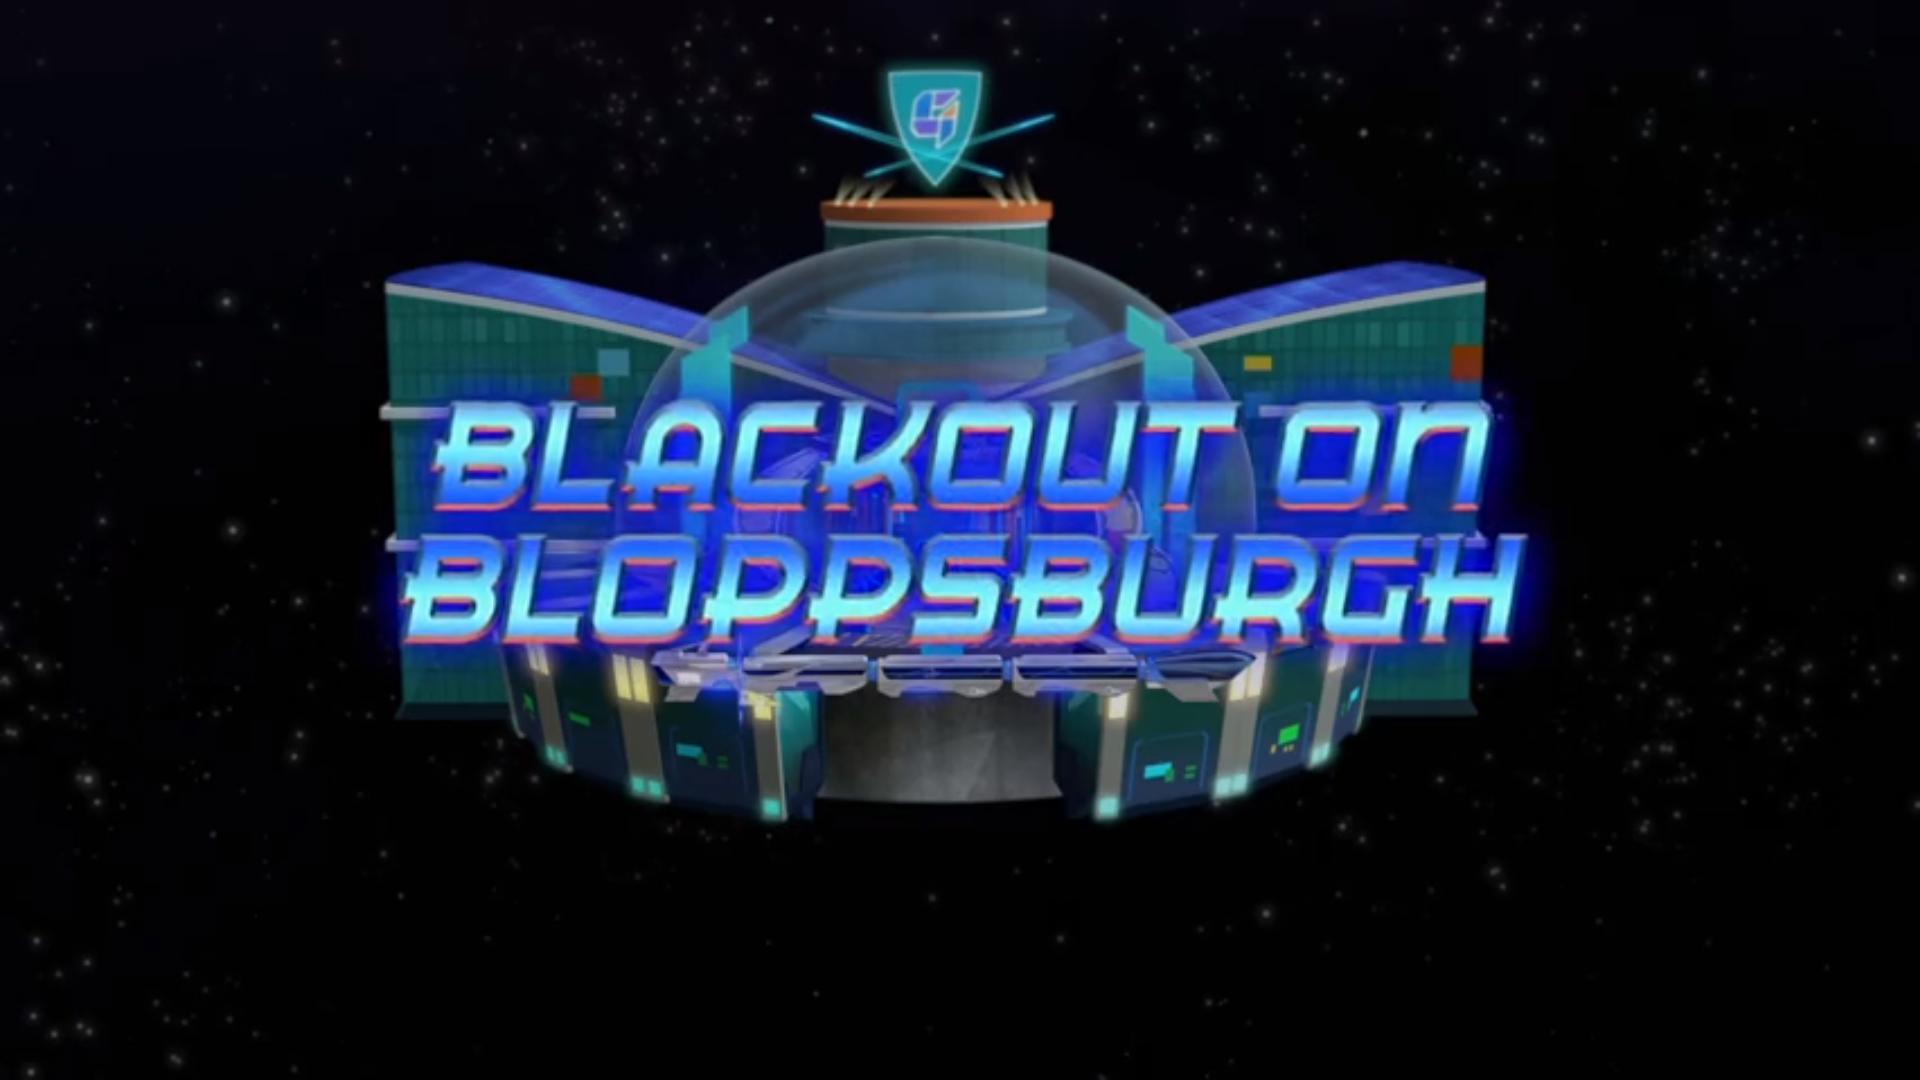 Blackout on Bloppsburgh